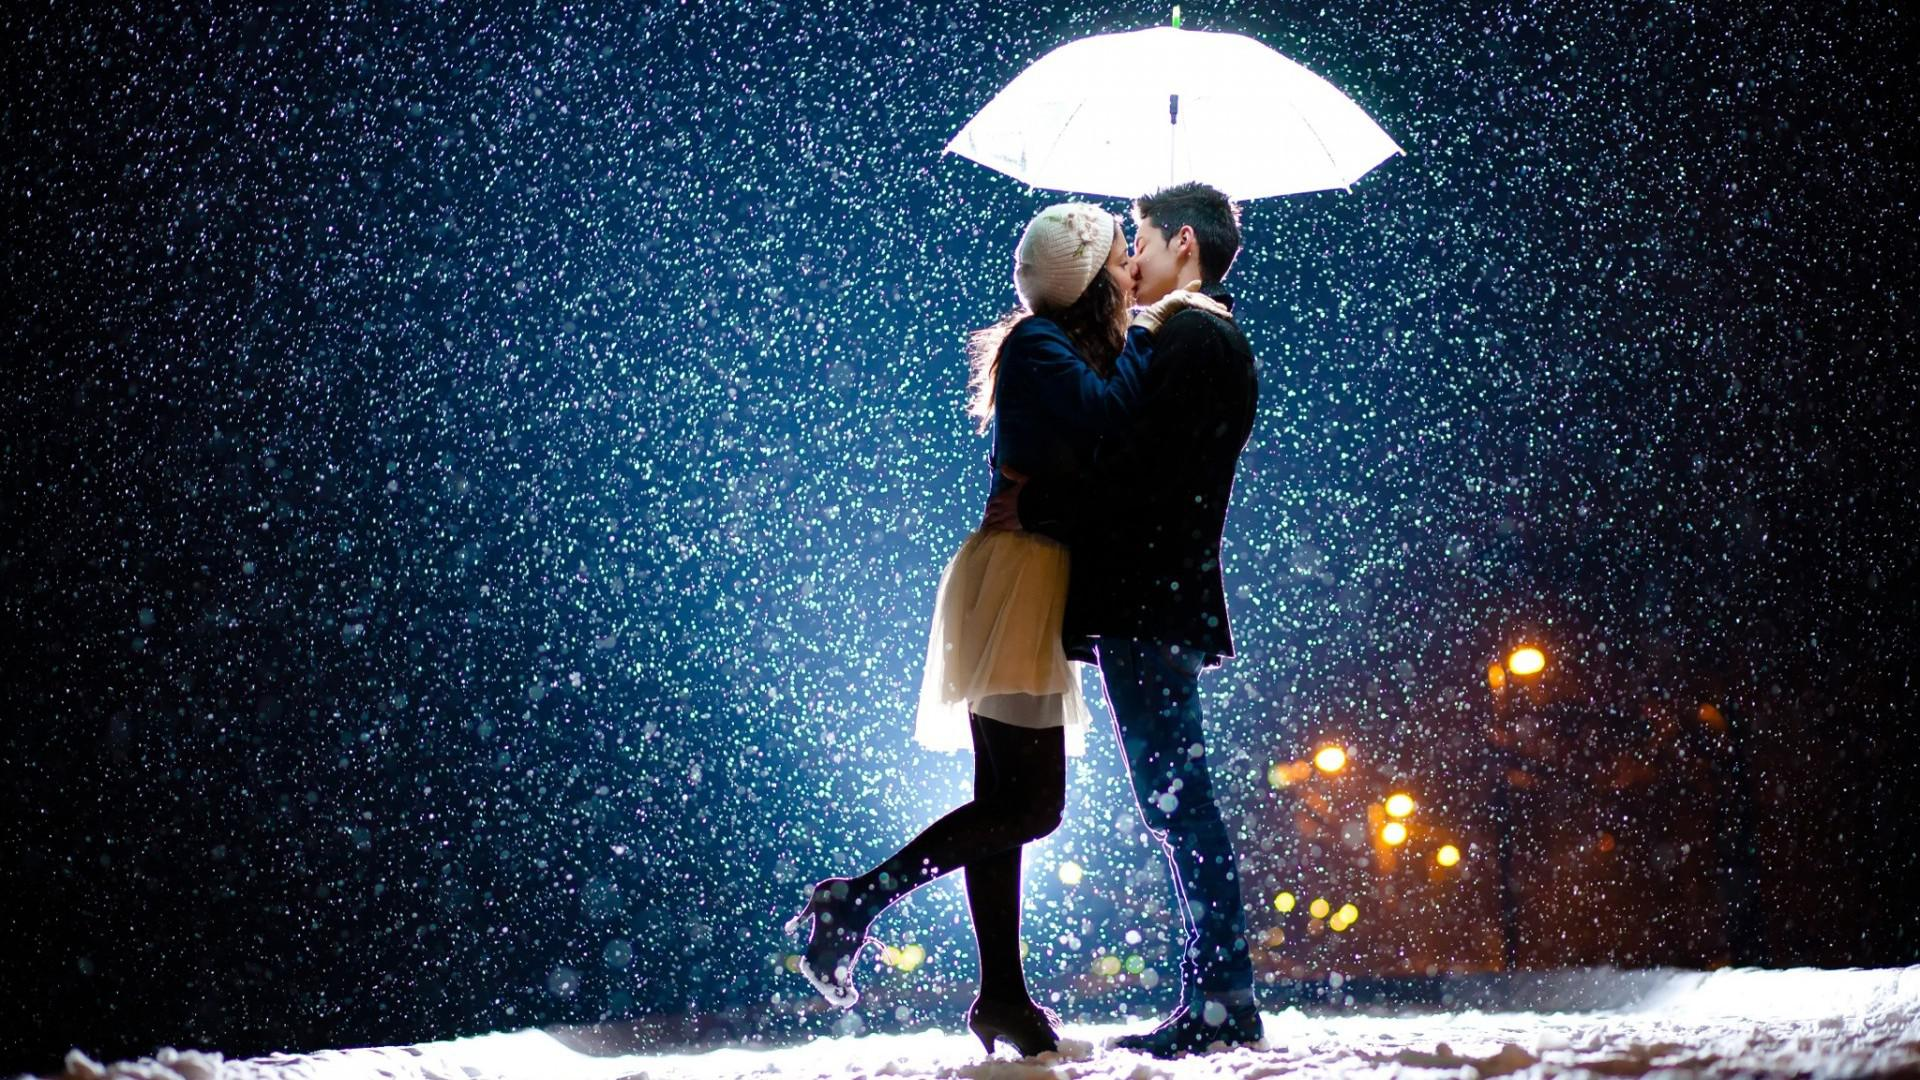 Hot-Couple-Love-Wallpaper For WideScreen